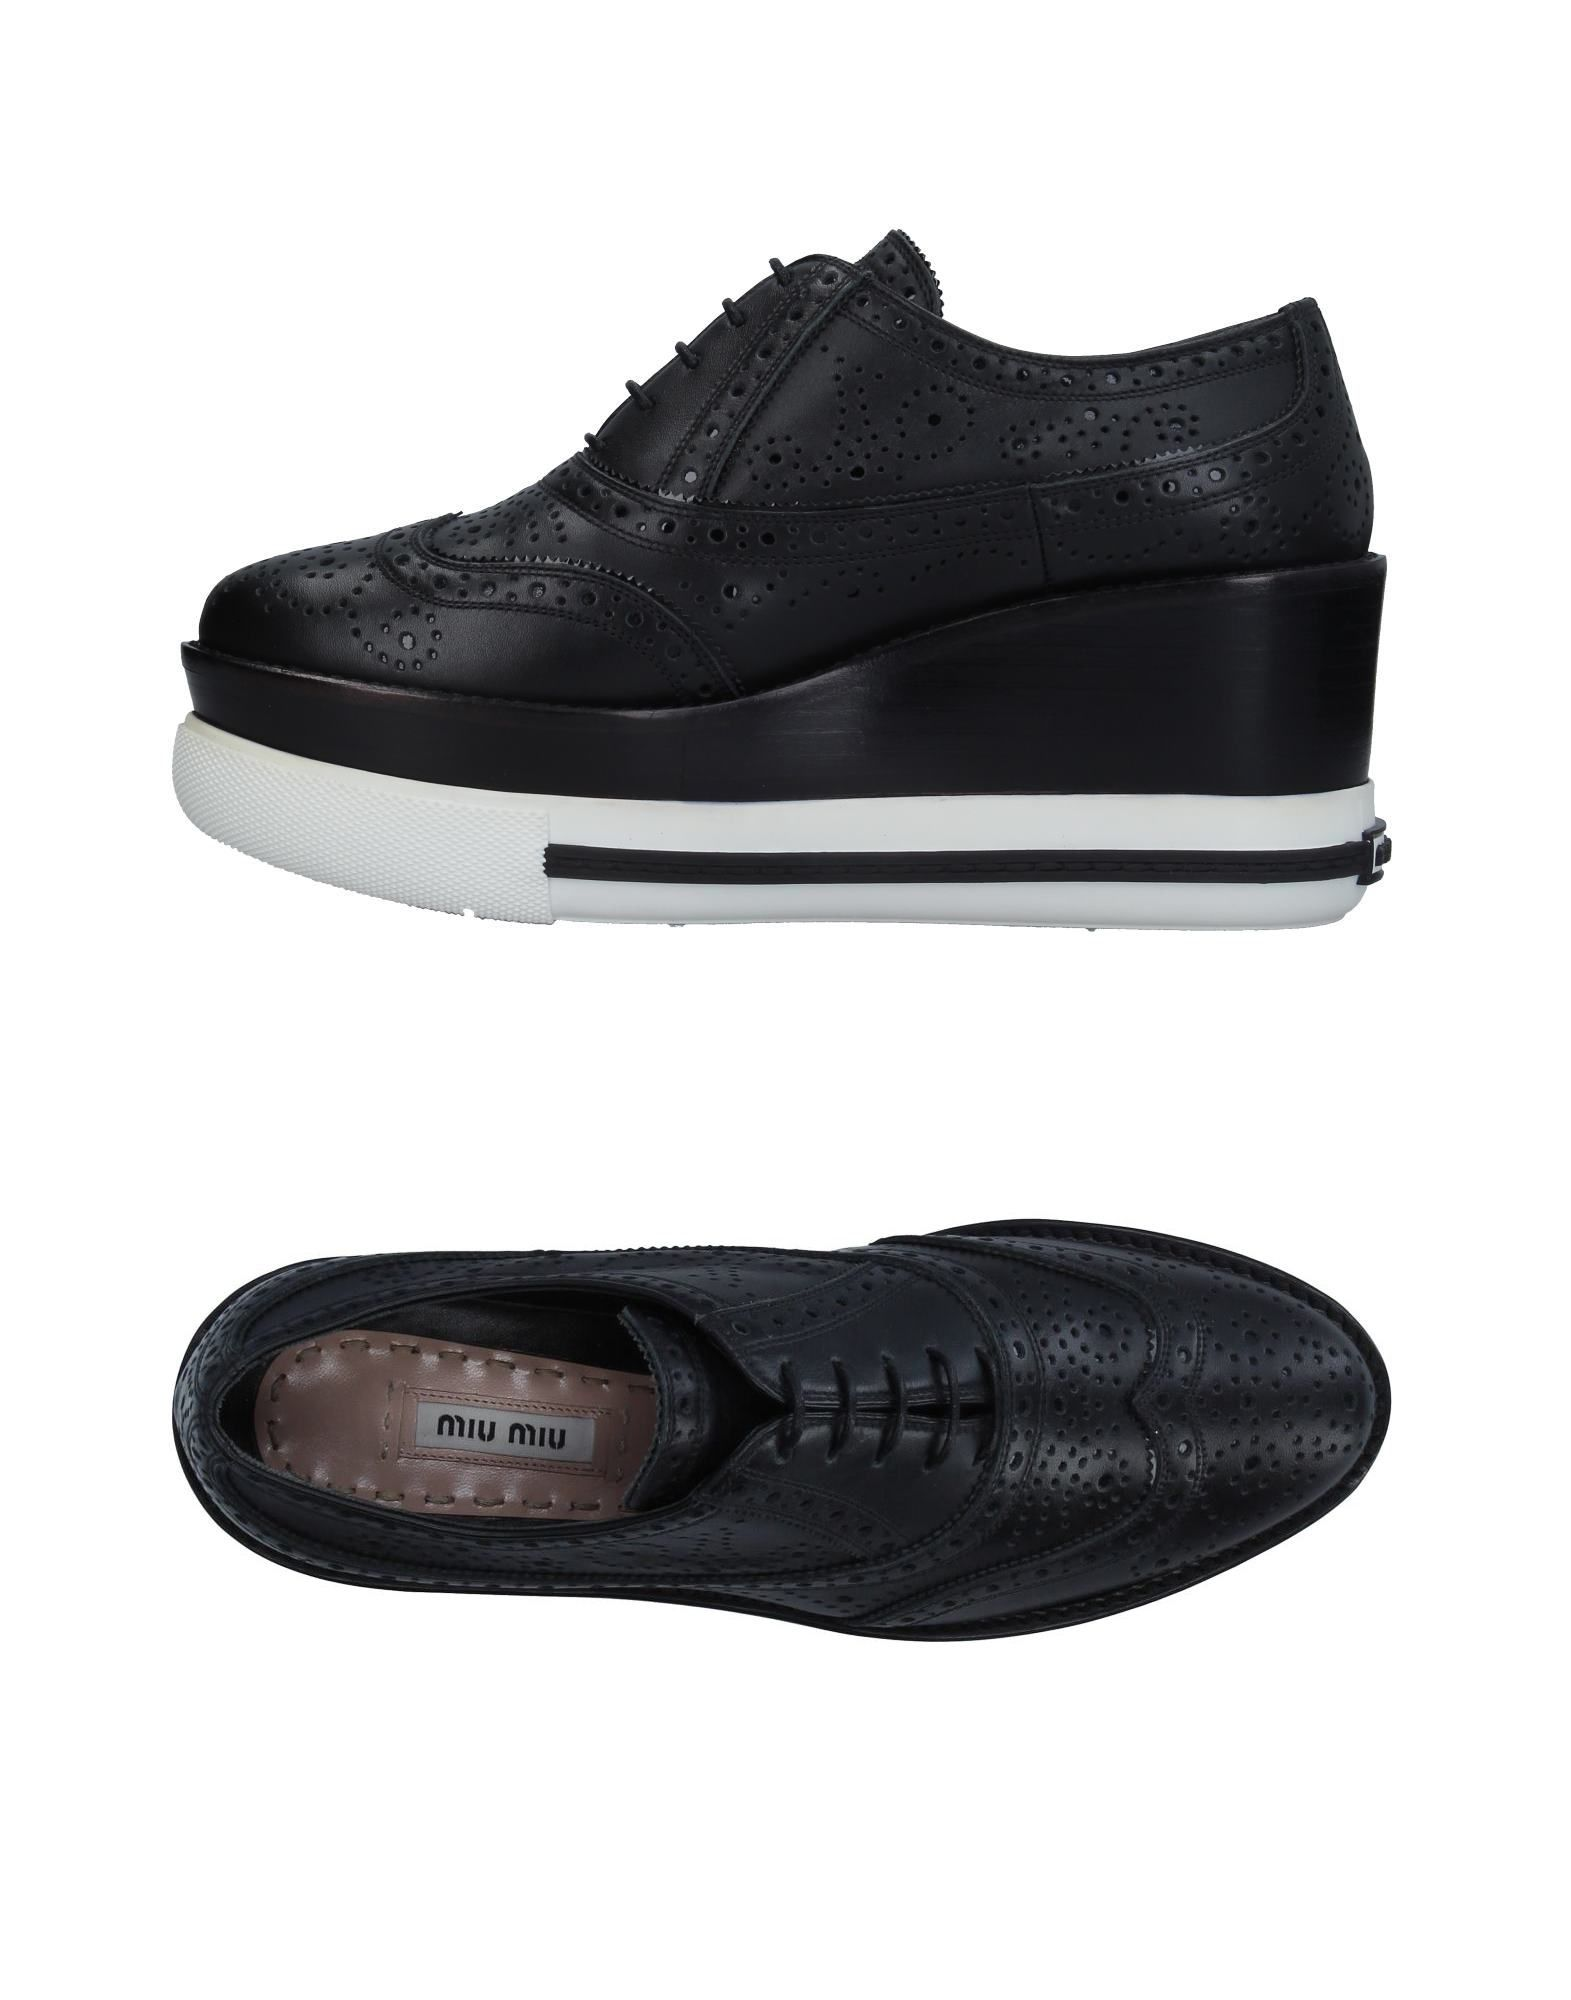 MIU MIU Обувь на шнурках первый внутри обувь обувь обувь обувь обувь обувь обувь обувь обувь 8a2549 мужская армия green 40 метров